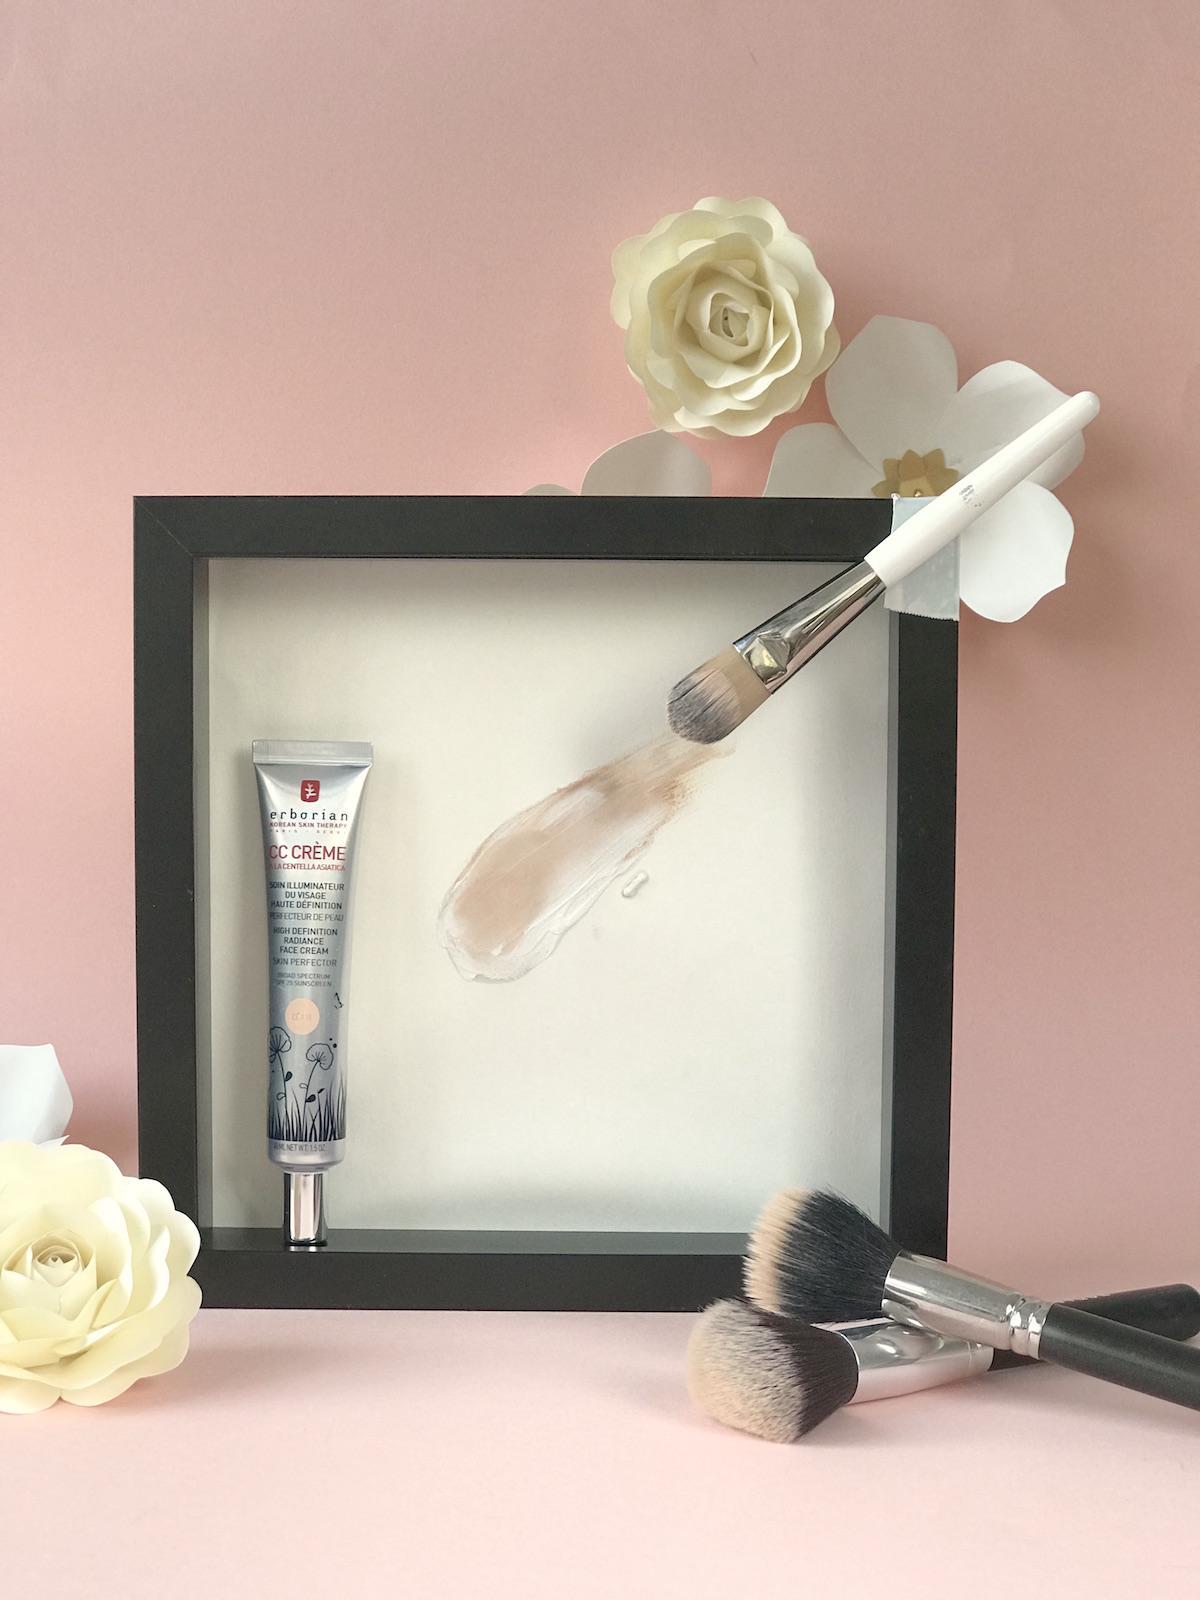 Erborian cc krema korejska kozmetika beautyfull blog